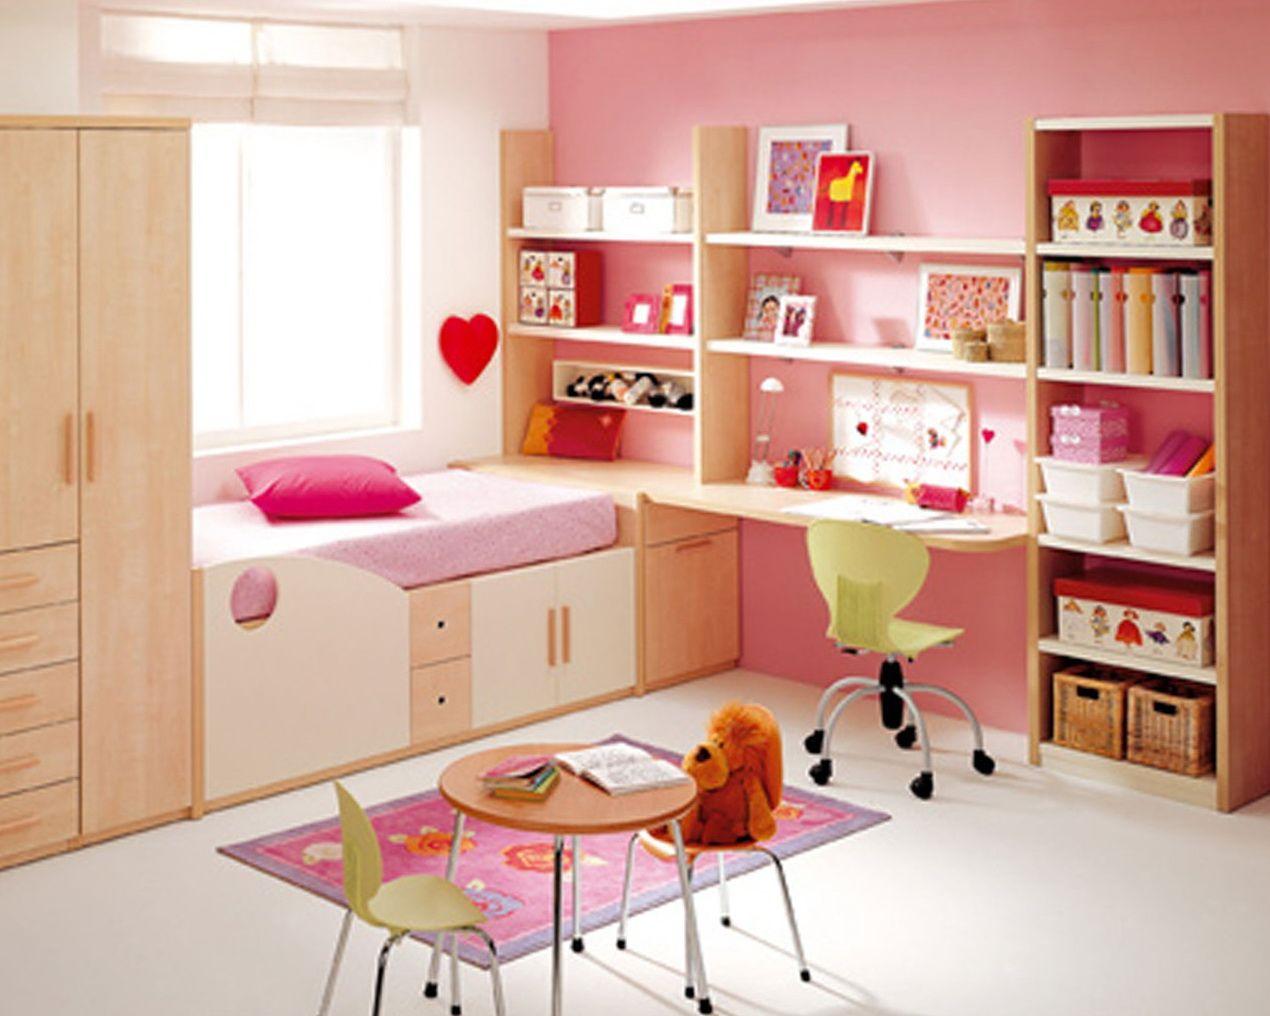 Design Your Own Bedroom Game 27 Beautiful Girls Bedroom Ideas For Small Rooms Teenage Bedroom